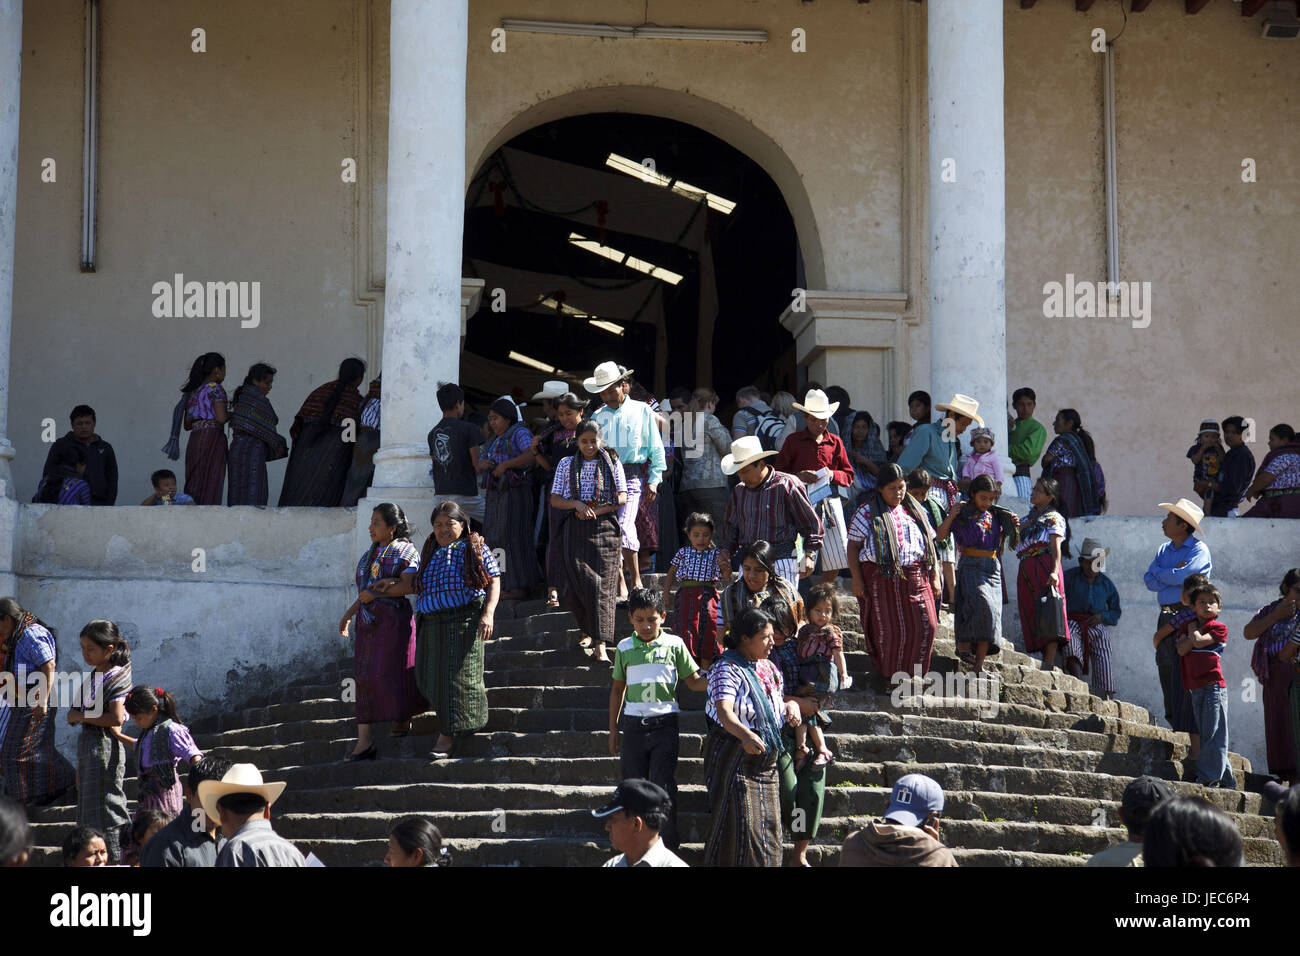 Guatemala, Atitlan lake, church, Santiago Atitlan, people, no model release, - Stock Image